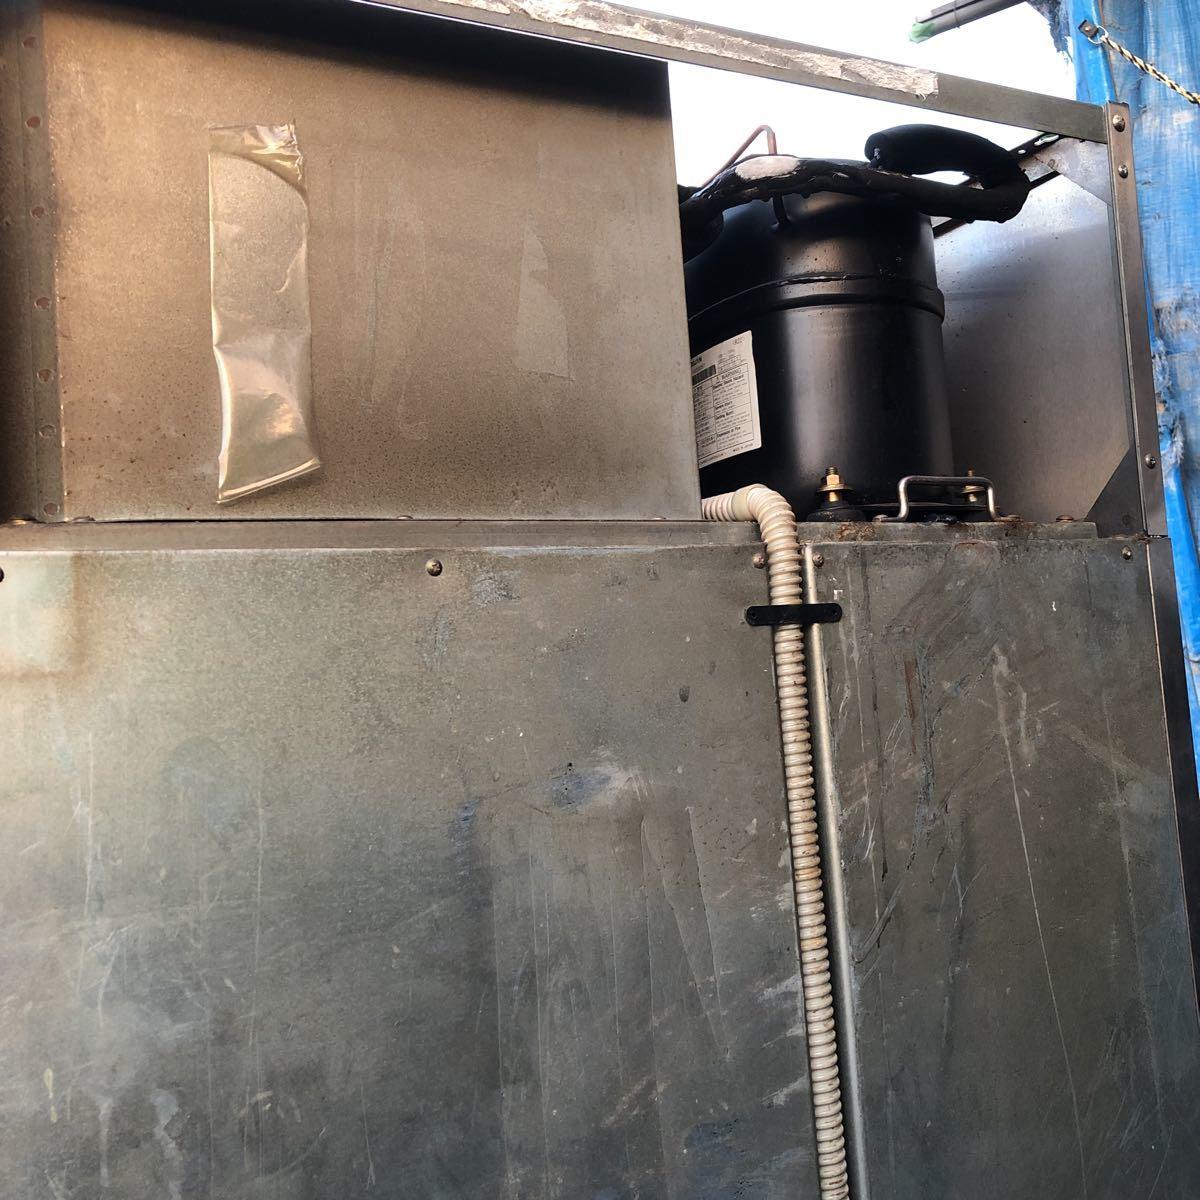 FUJIMAK フジマック 業務用冷凍冷蔵庫 FR7680FGD 2ドア 埼玉県ふじみ野市にて引取限定_画像8